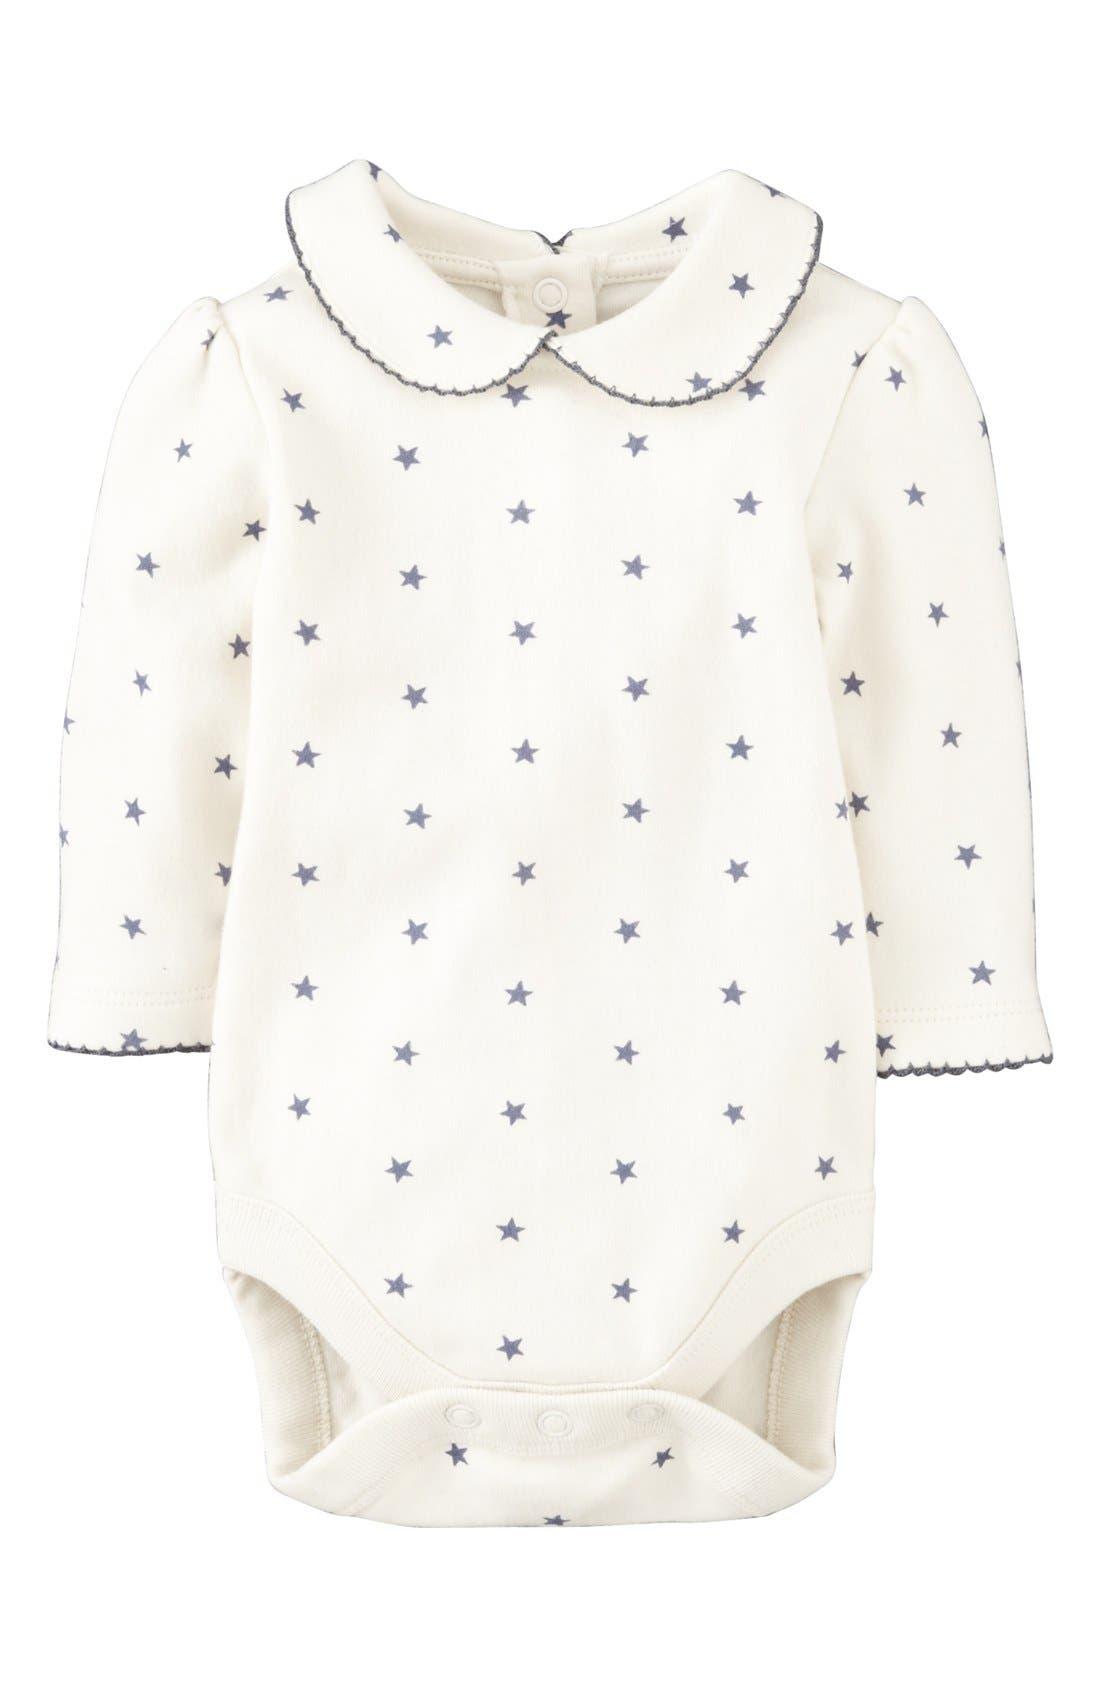 Main Image - Mini Boden 'Pretty Collar' Bodysuit (Baby Girls)